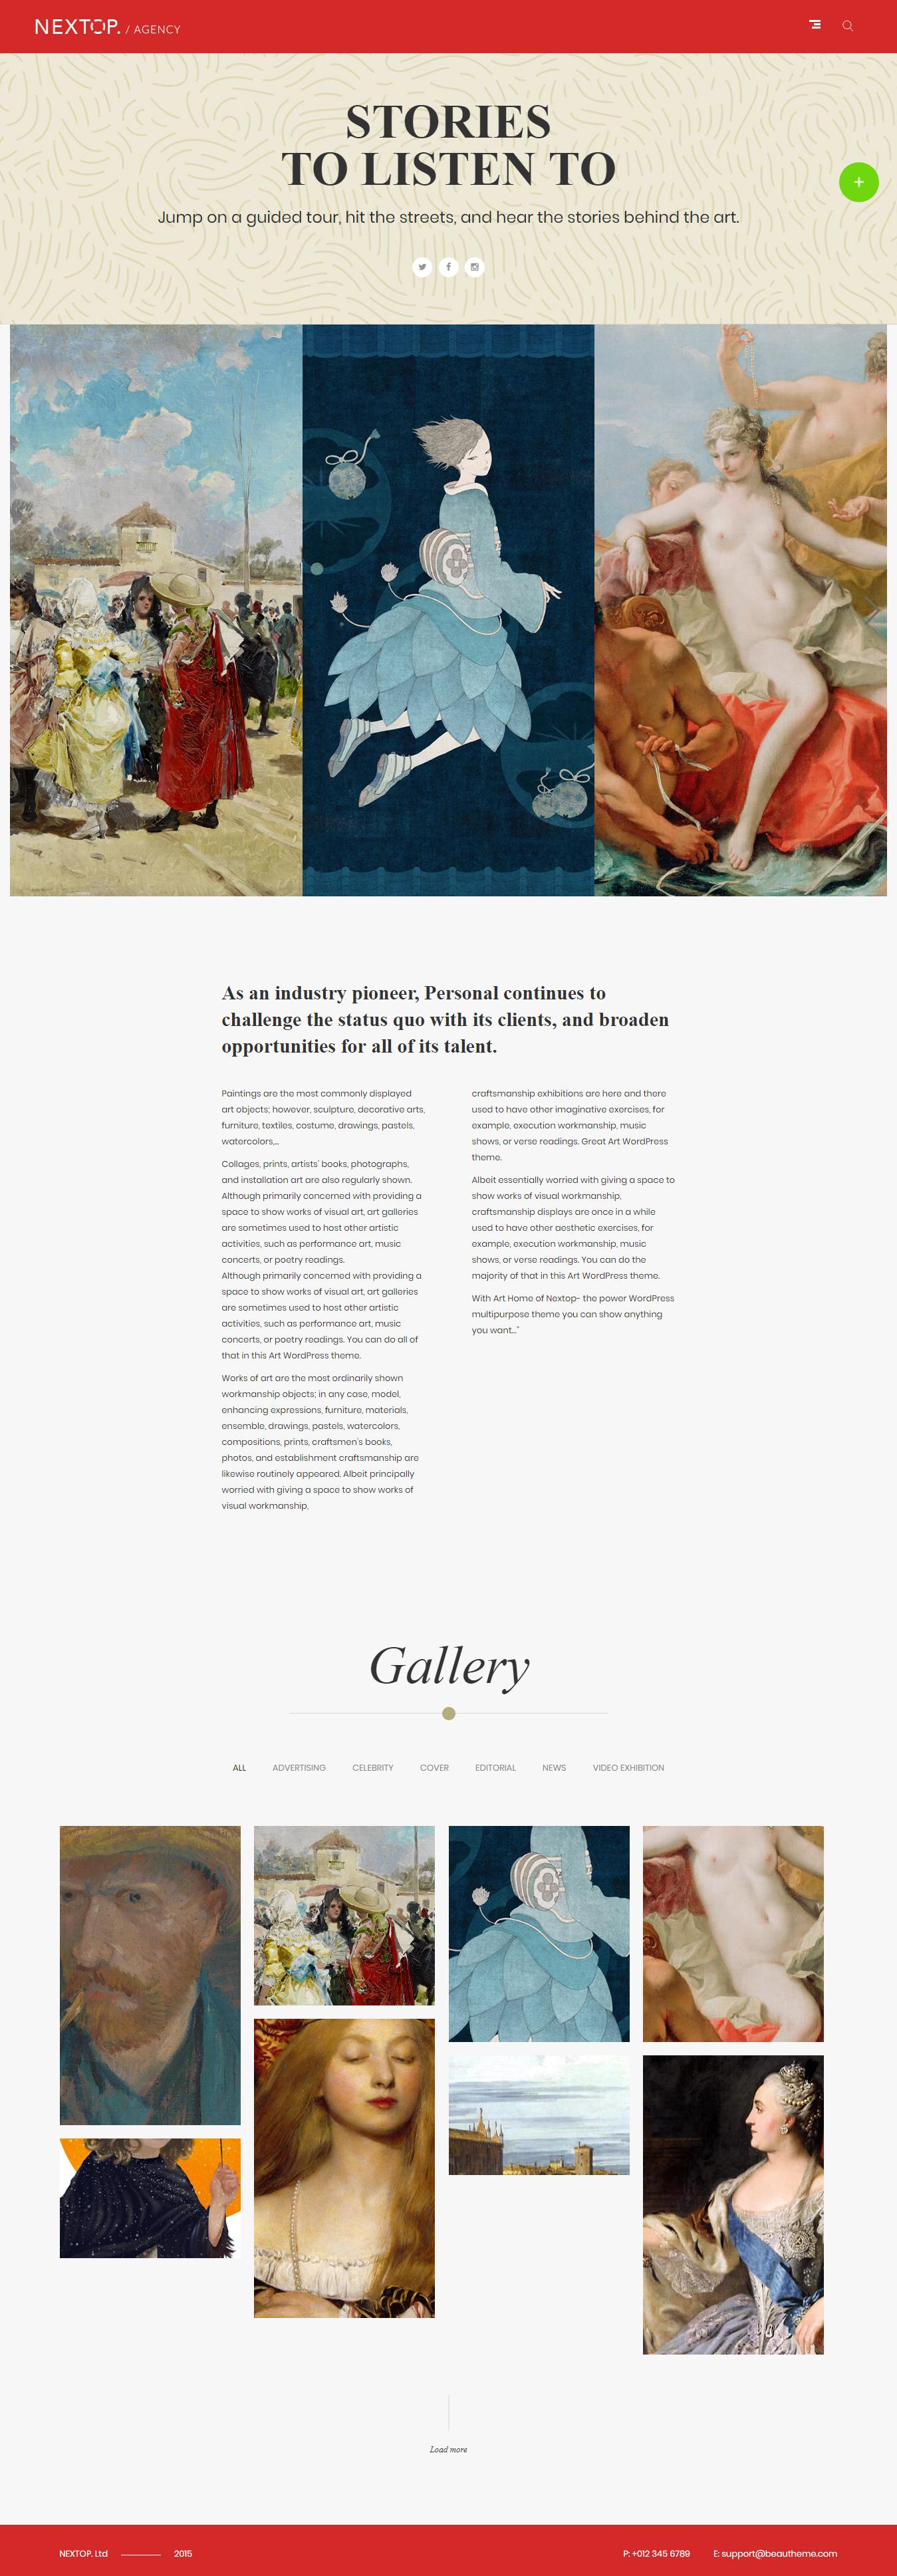 nextop best premium gallery wordpress theme - 10+ Best Premium Gallery WordPress Themes